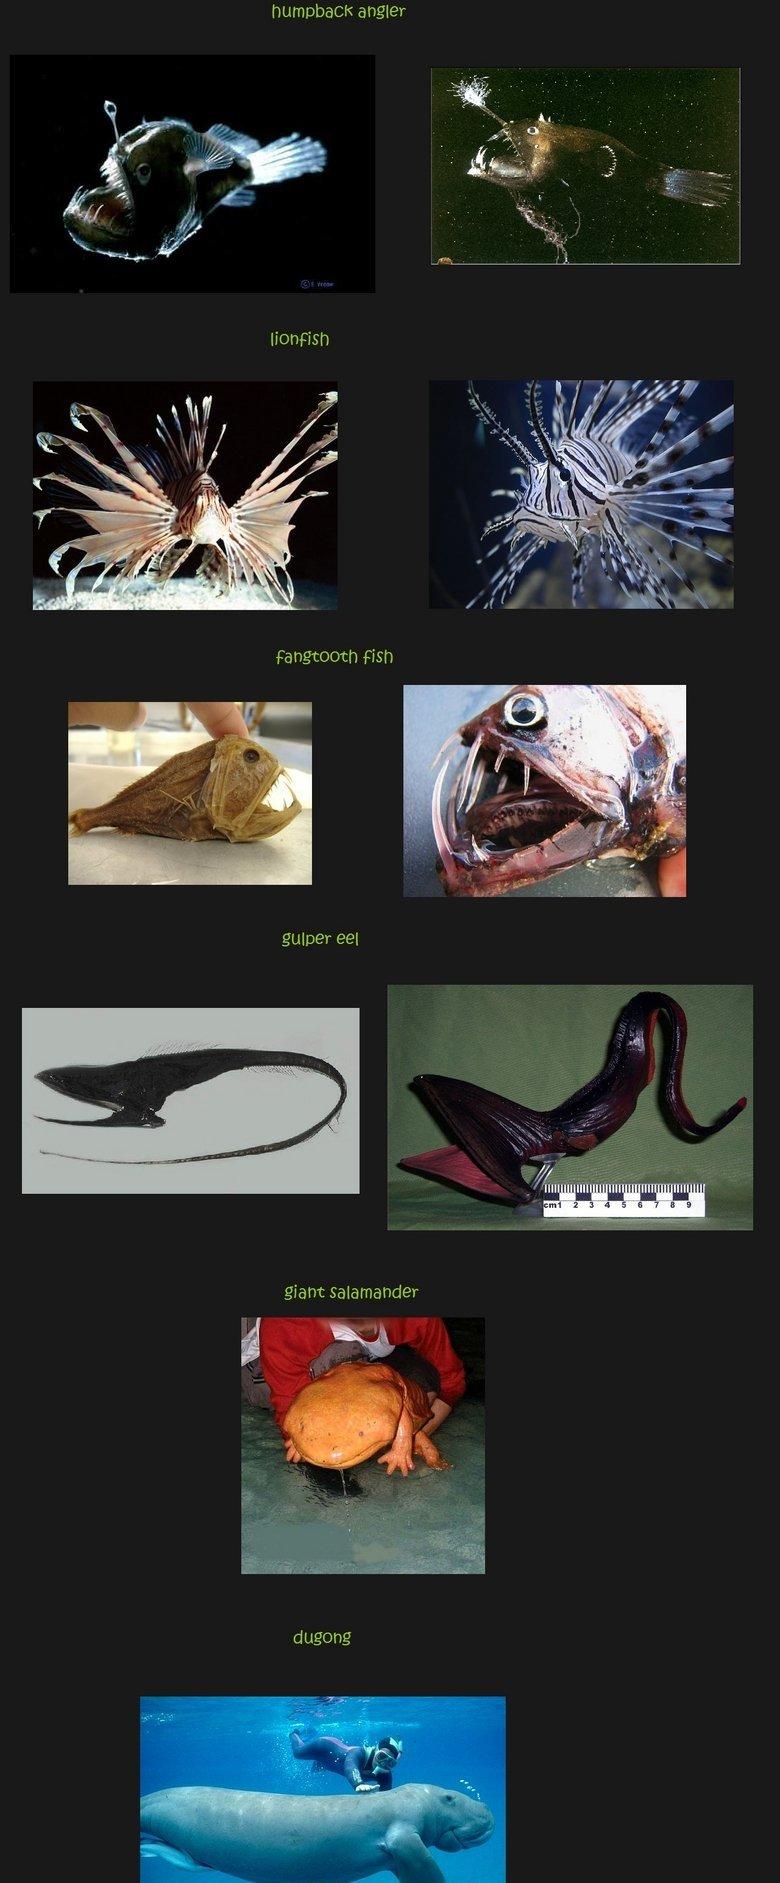 Amazing sea creatures comp 2. Part 1 : /funny_pictures/1356812/Amazing+sea+c.... Cft angler 1 ml III] I giant cis:. Still no axolotl You make mudkip very sad sea creatures